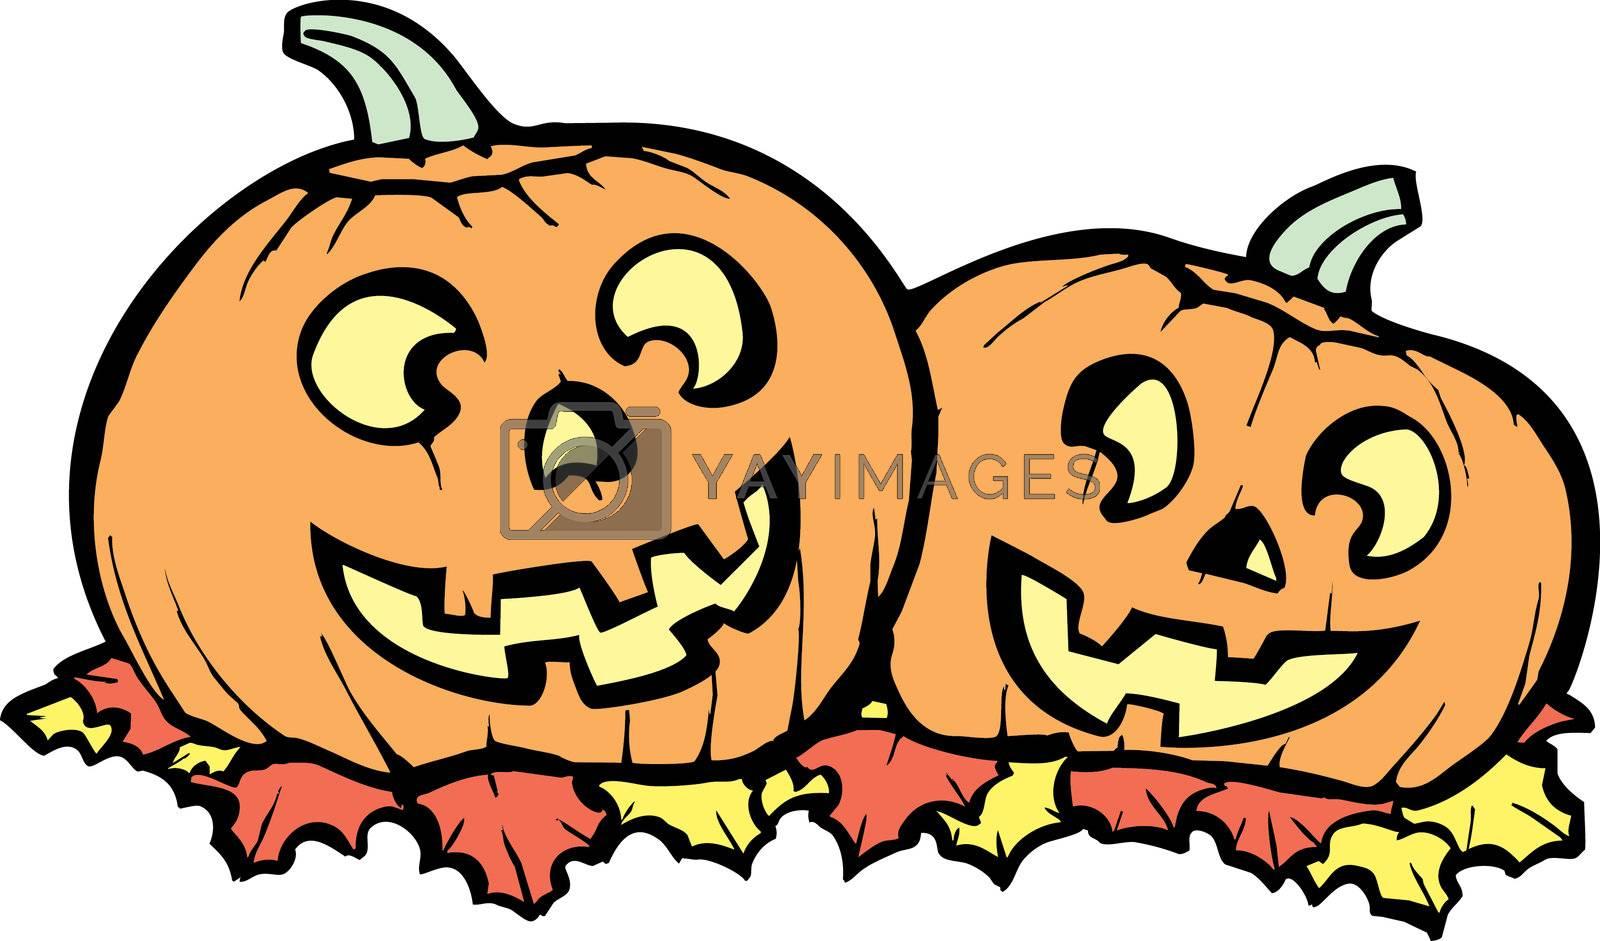 Two orange Jack-o-Lanterns lit up for Halloween night.